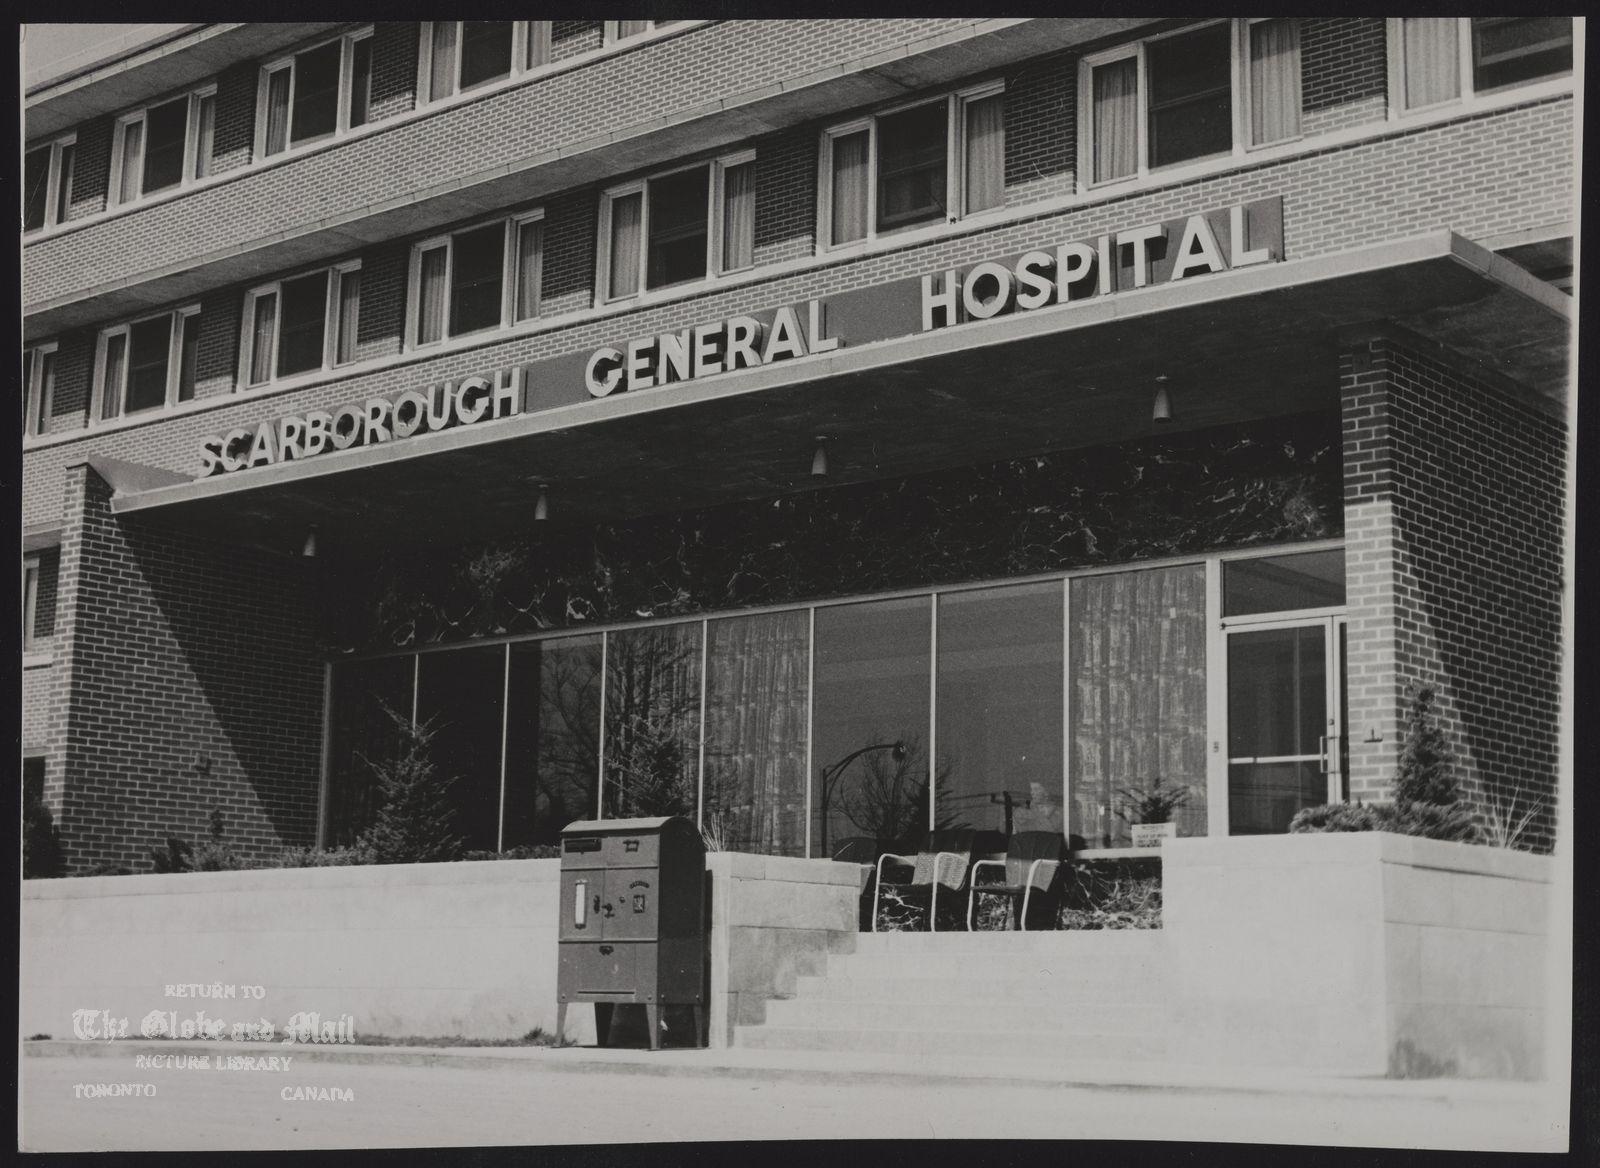 HOSPITALS Scarboro General Hospital.